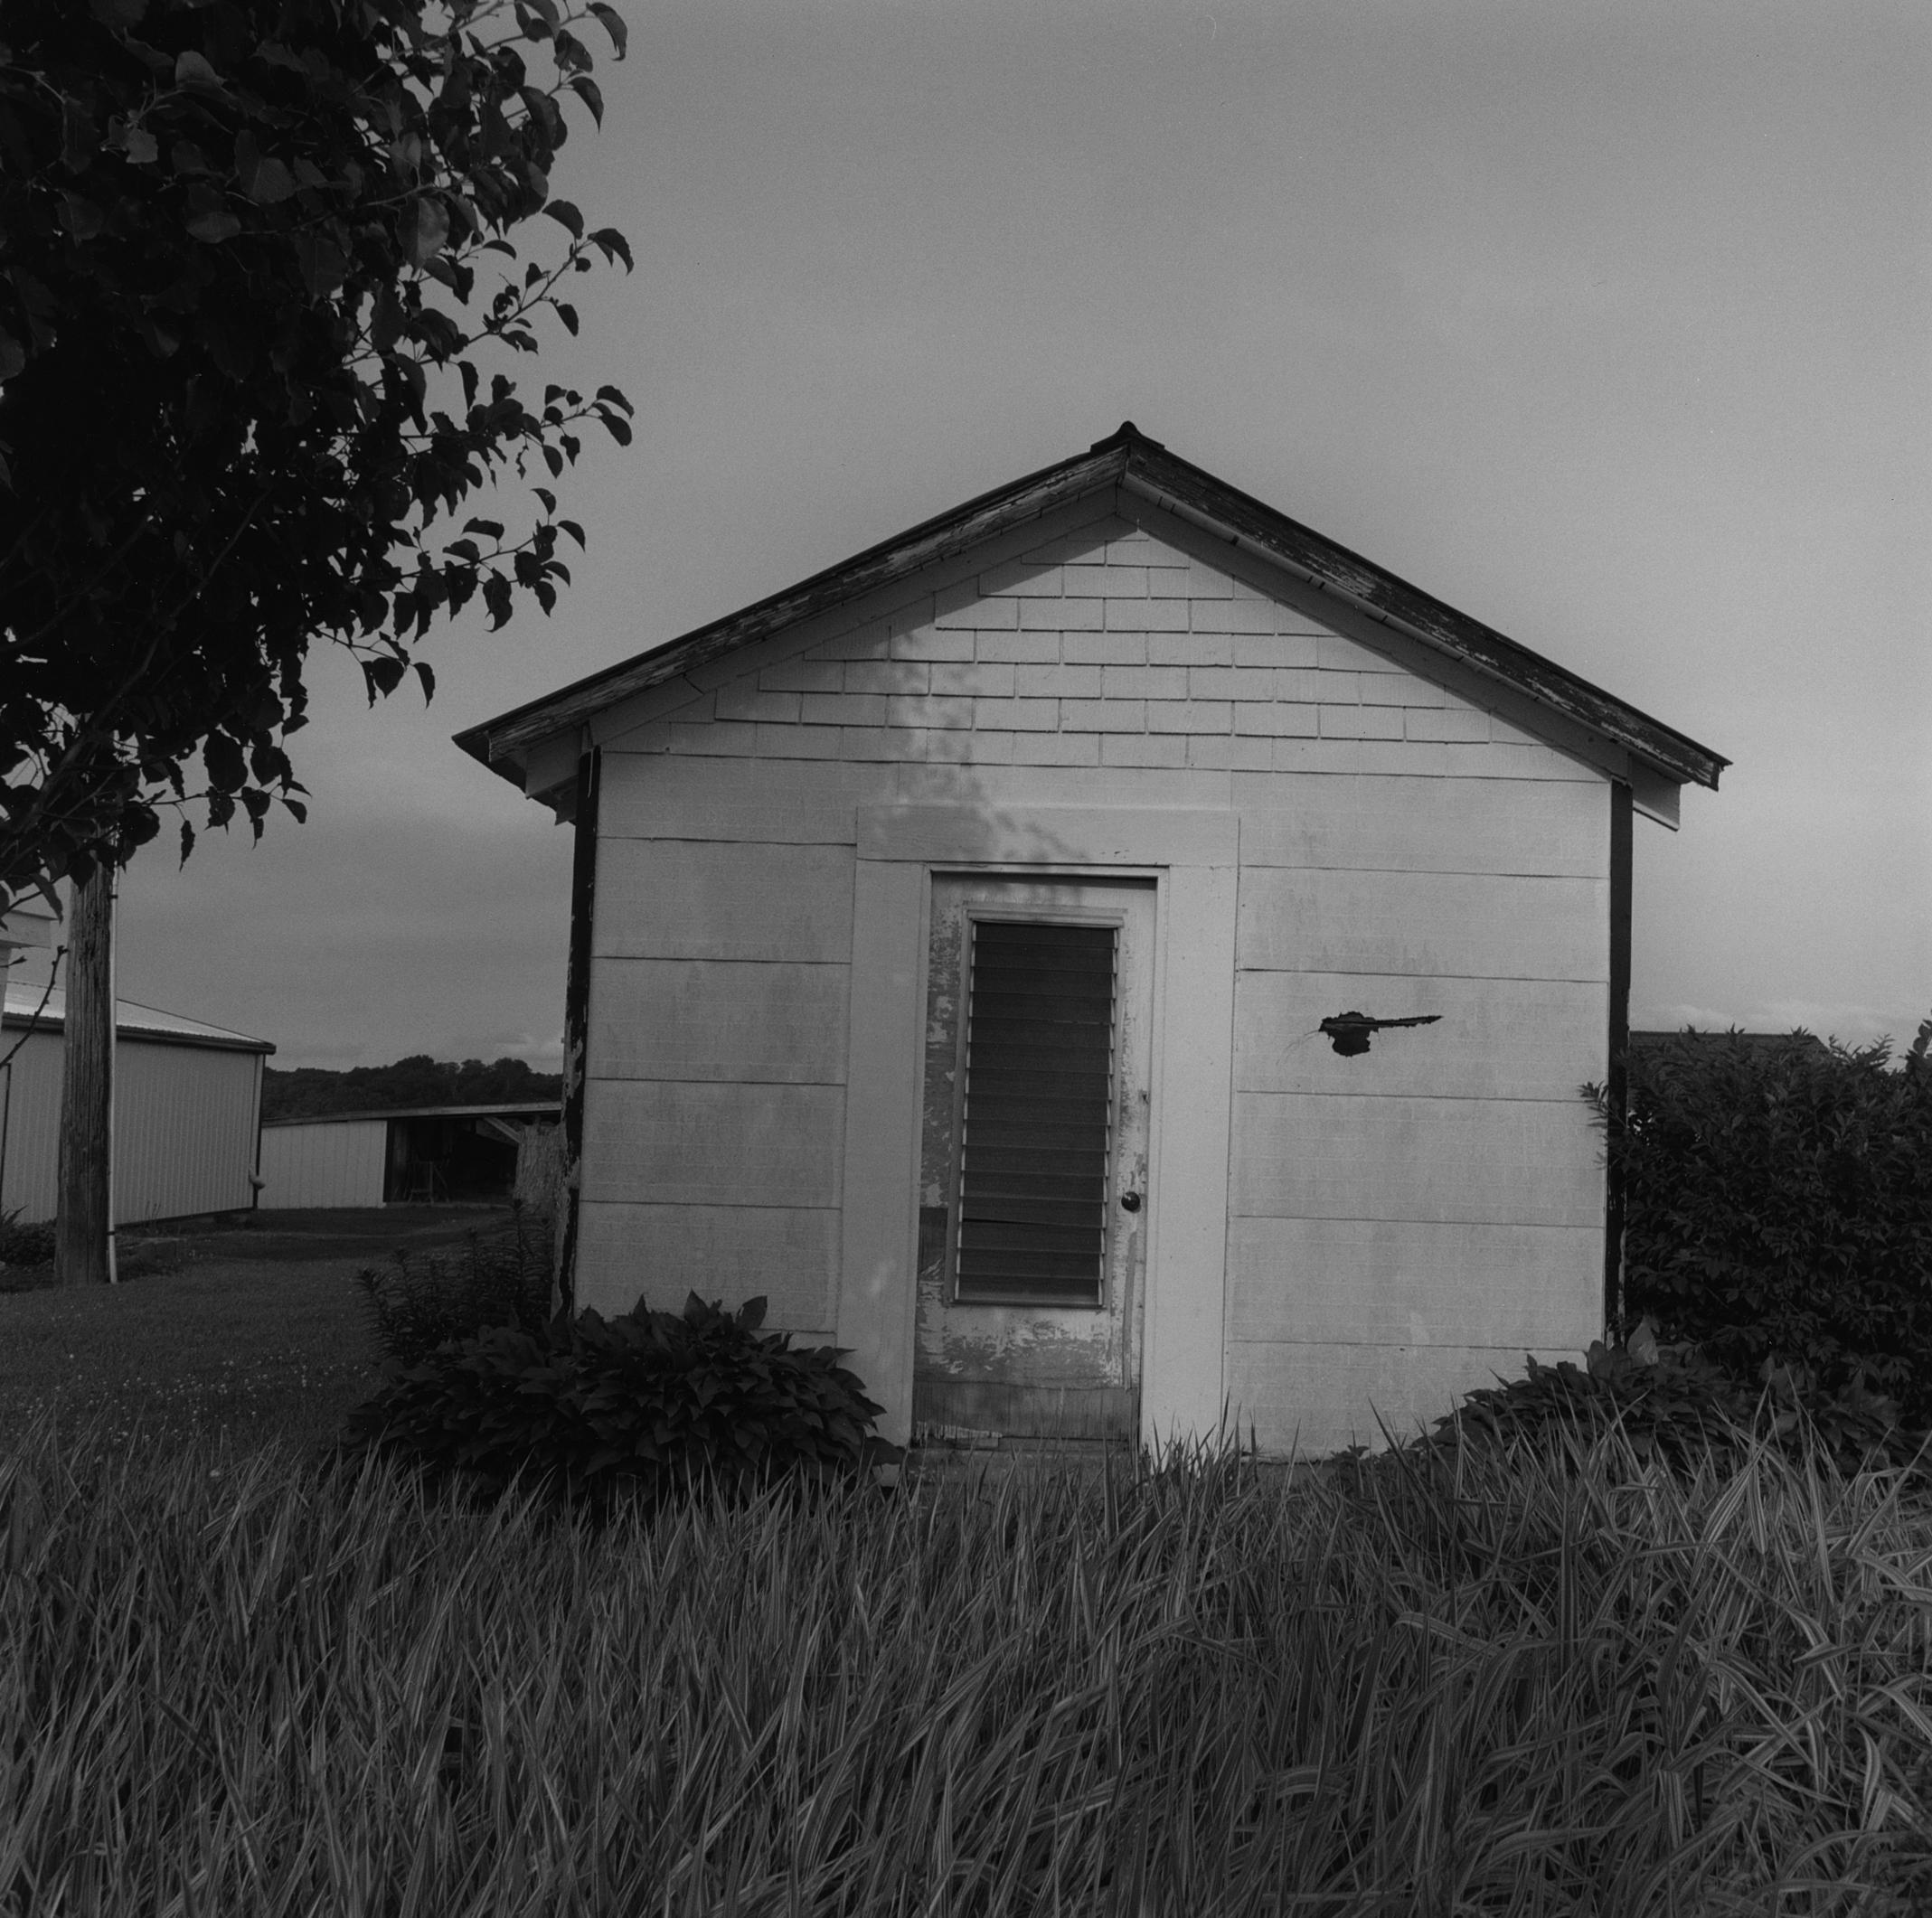 Johnson Family Farm Building, Alton, Illinois, 2010